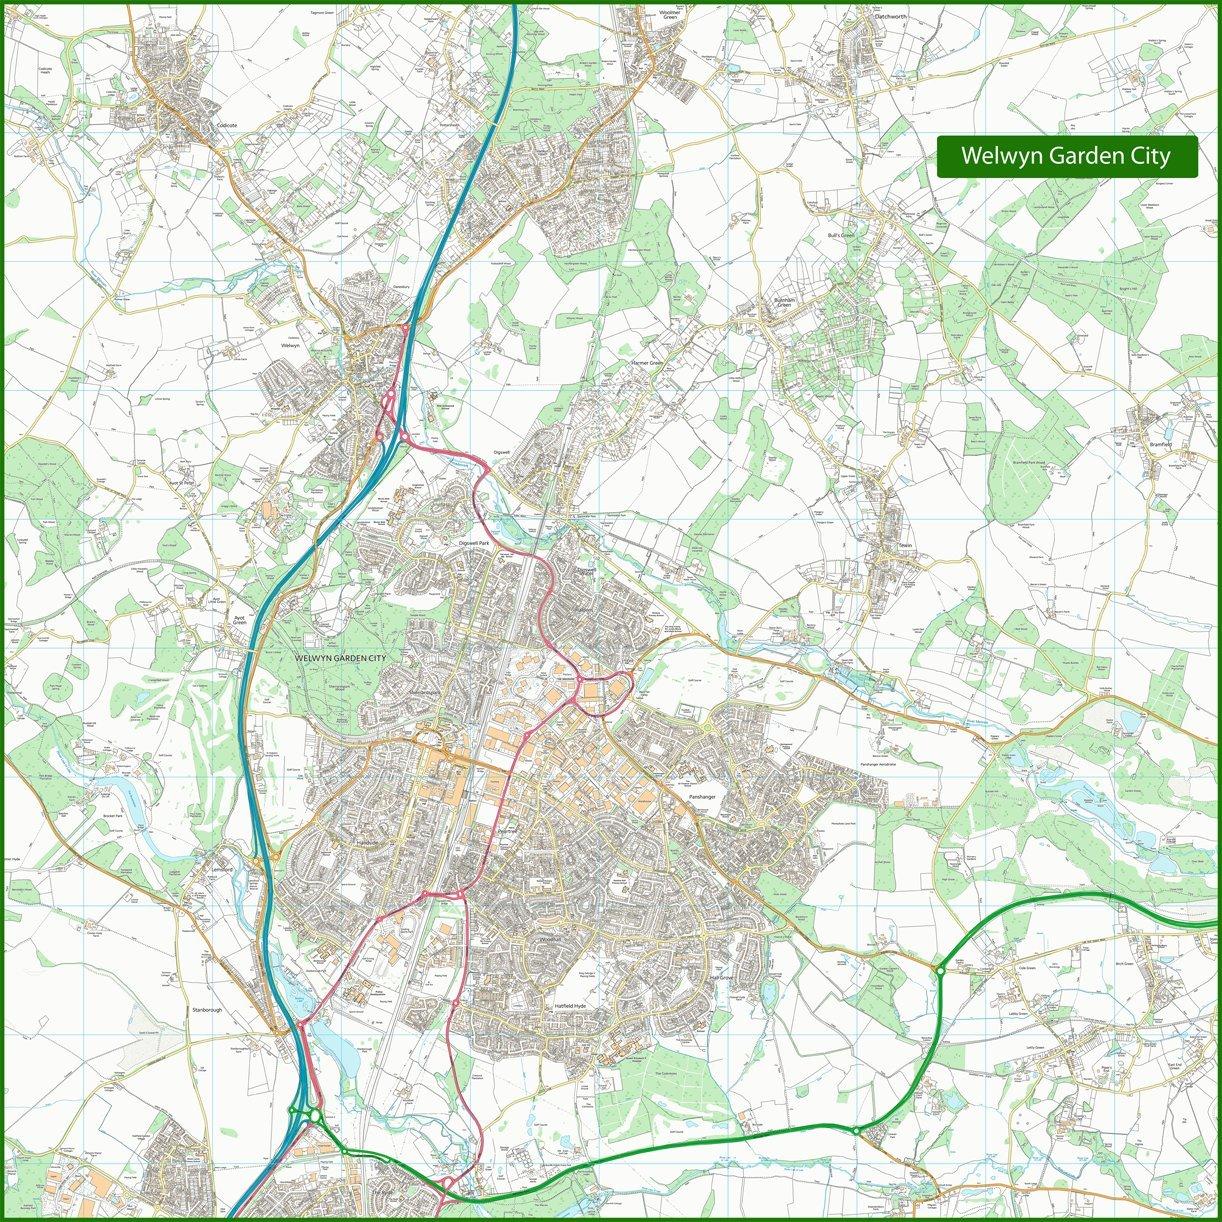 WELWYN Garden City calle mapa – x 125 x – 125 cm 6ded40